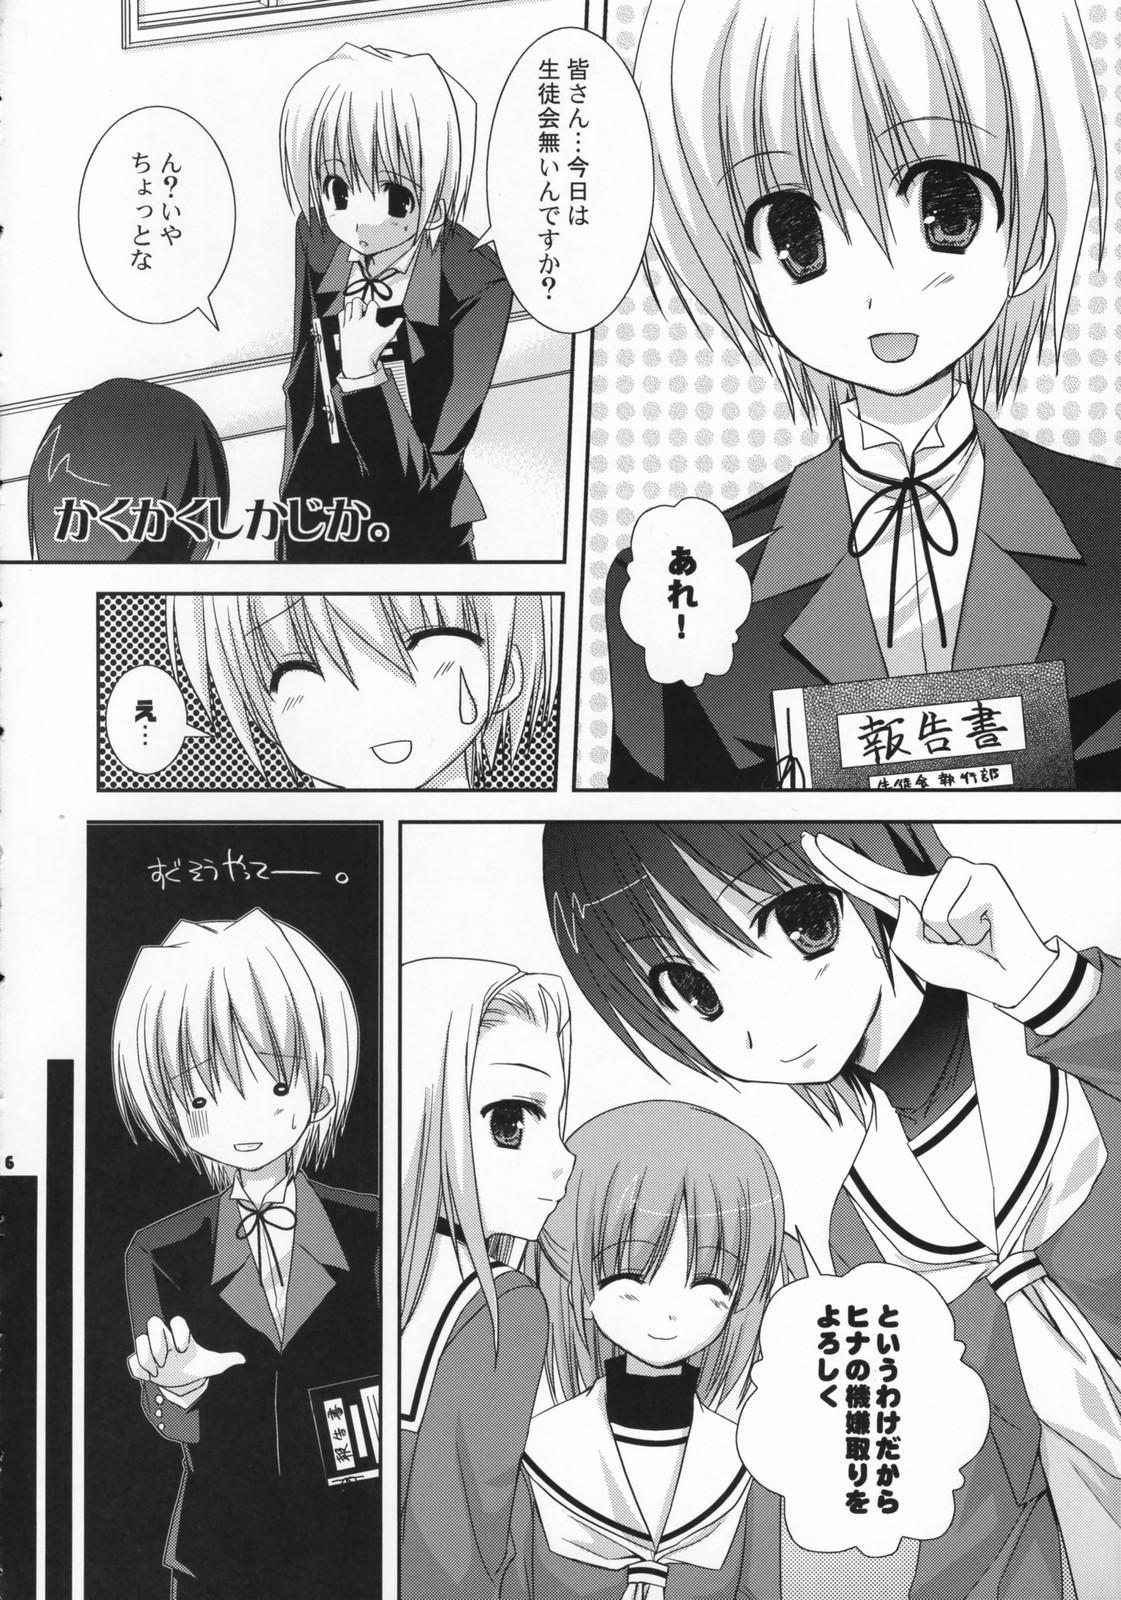 Tokimeki to Kiss 4